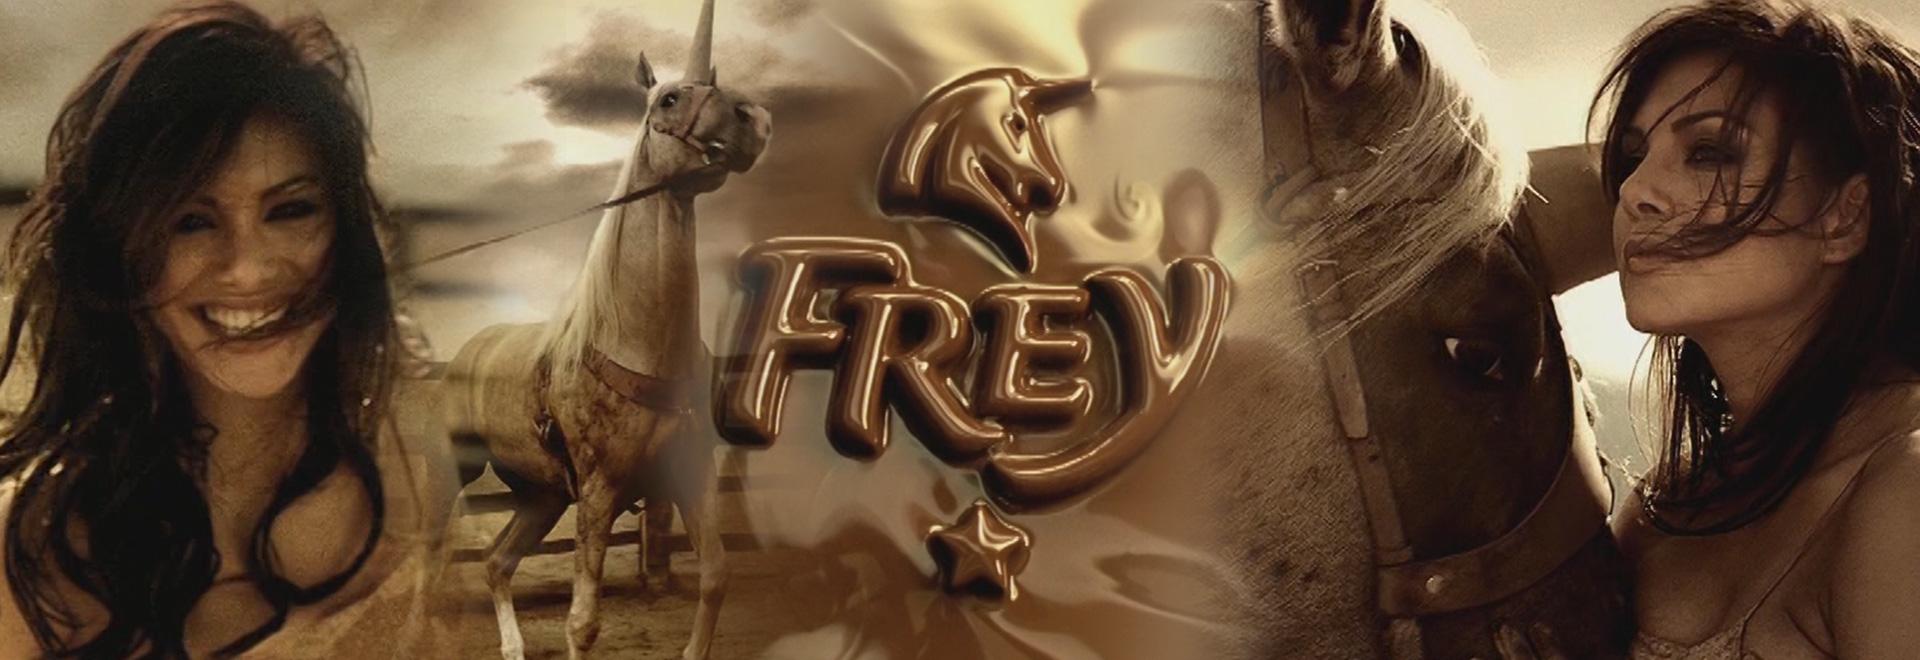 js-filmproduction-postproduction-commercial-chocolat-frey-header